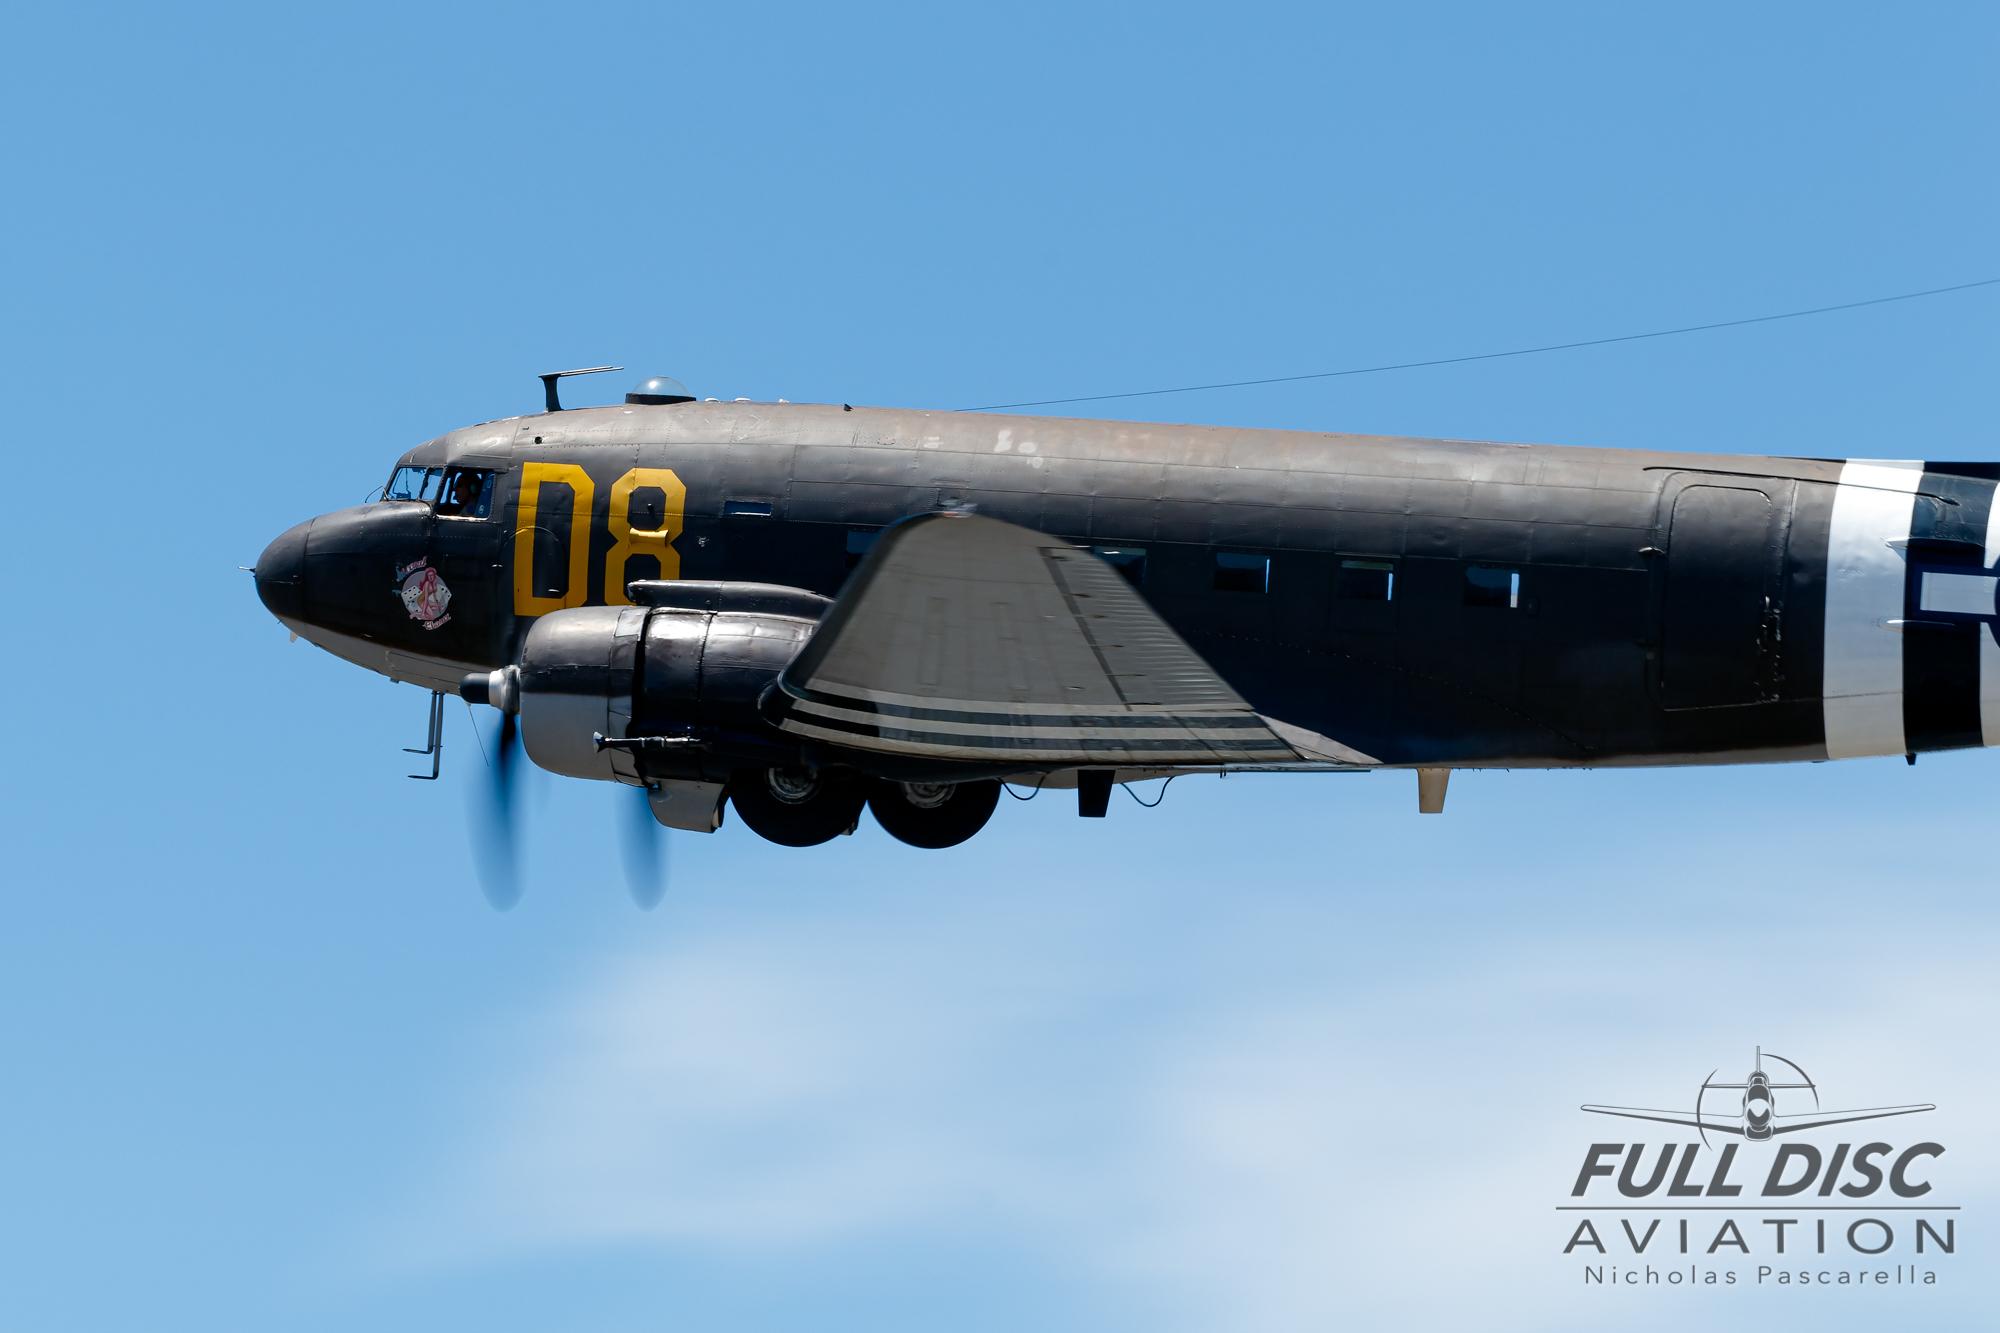 americanairpowermuseum_nicholaspascarella_nickpascarella_fulldiscaviation_legendsofairpower2019_aviation_warbird_c47_gooneybird_profile.jpg